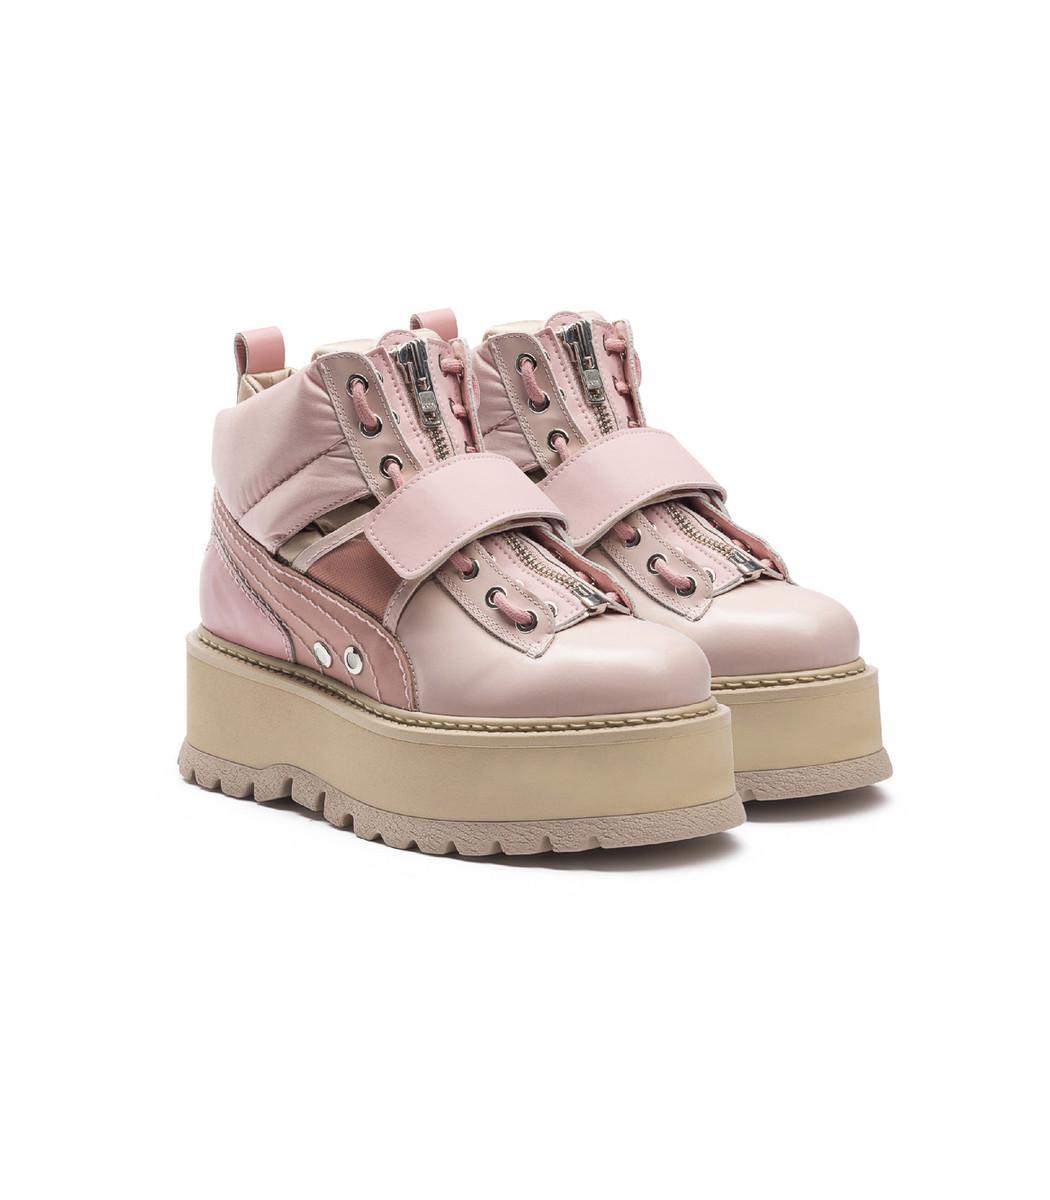 reputable site 5e0da 19f71 Women's Pink 'fenty X By Rihanna' Sneaker Boots